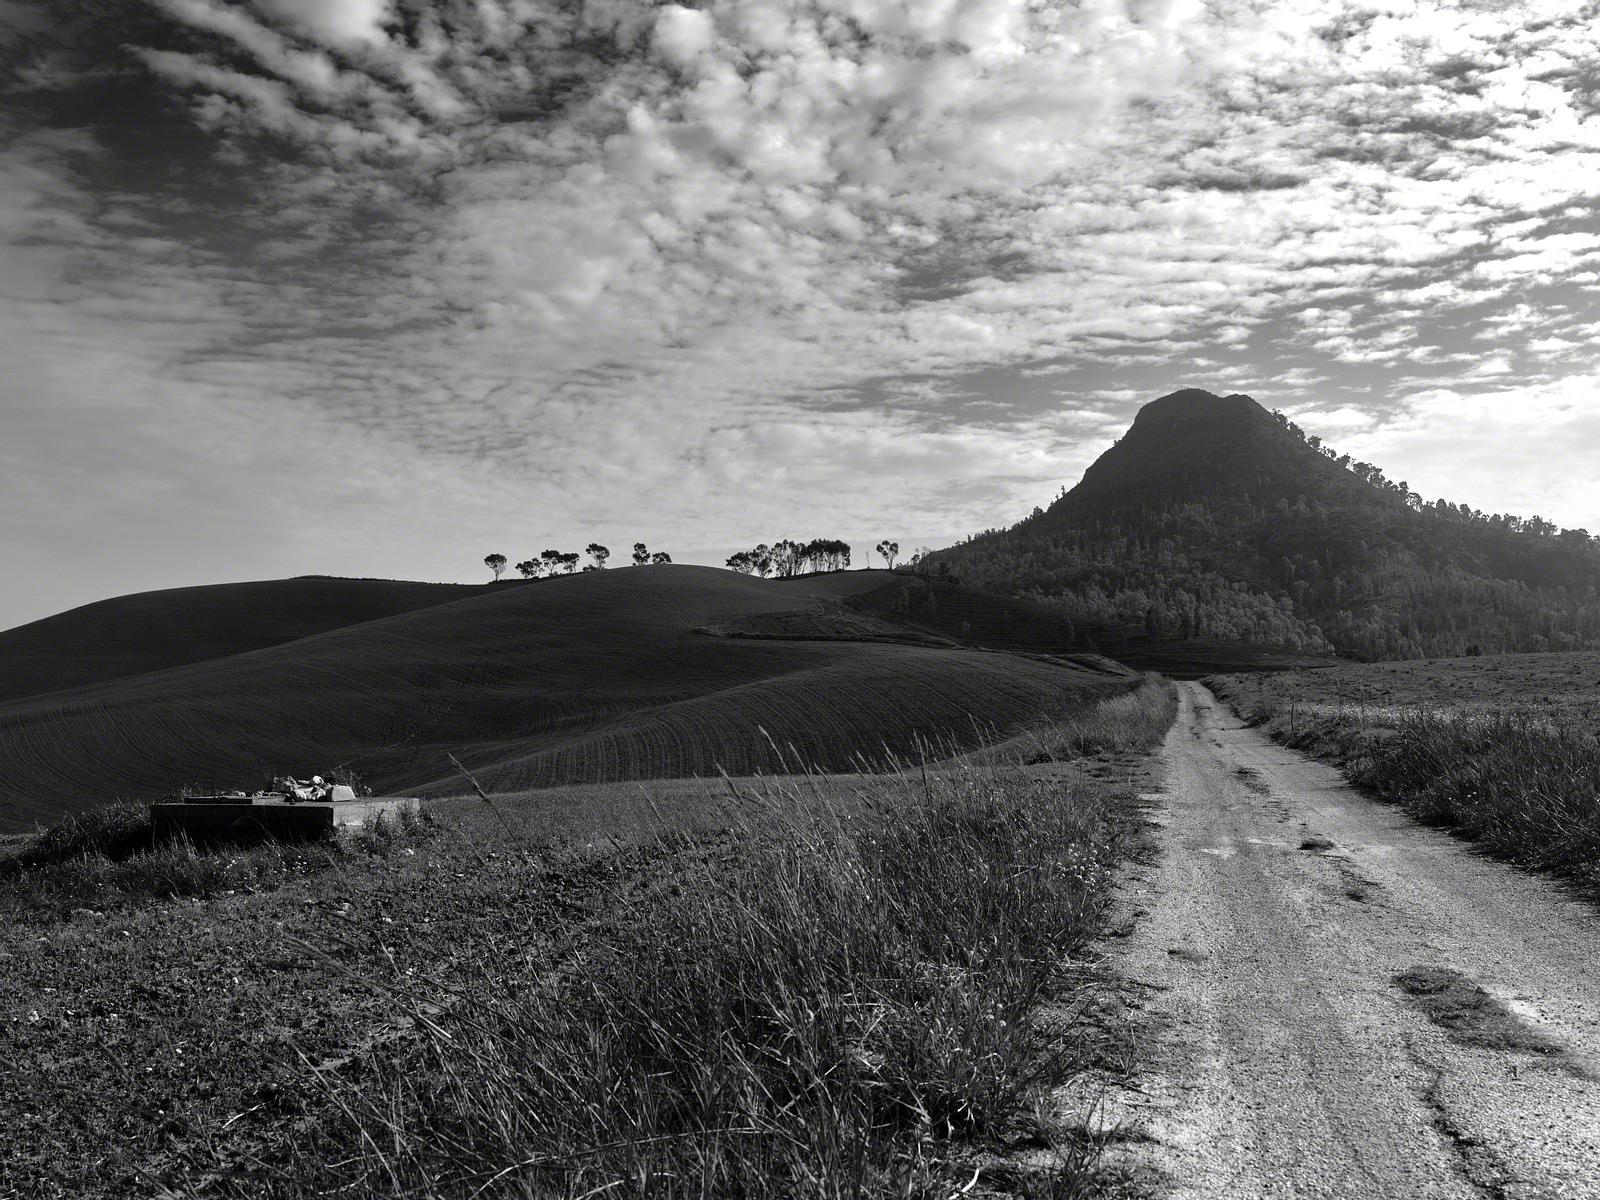 Monte Formaggio, Jan 2021